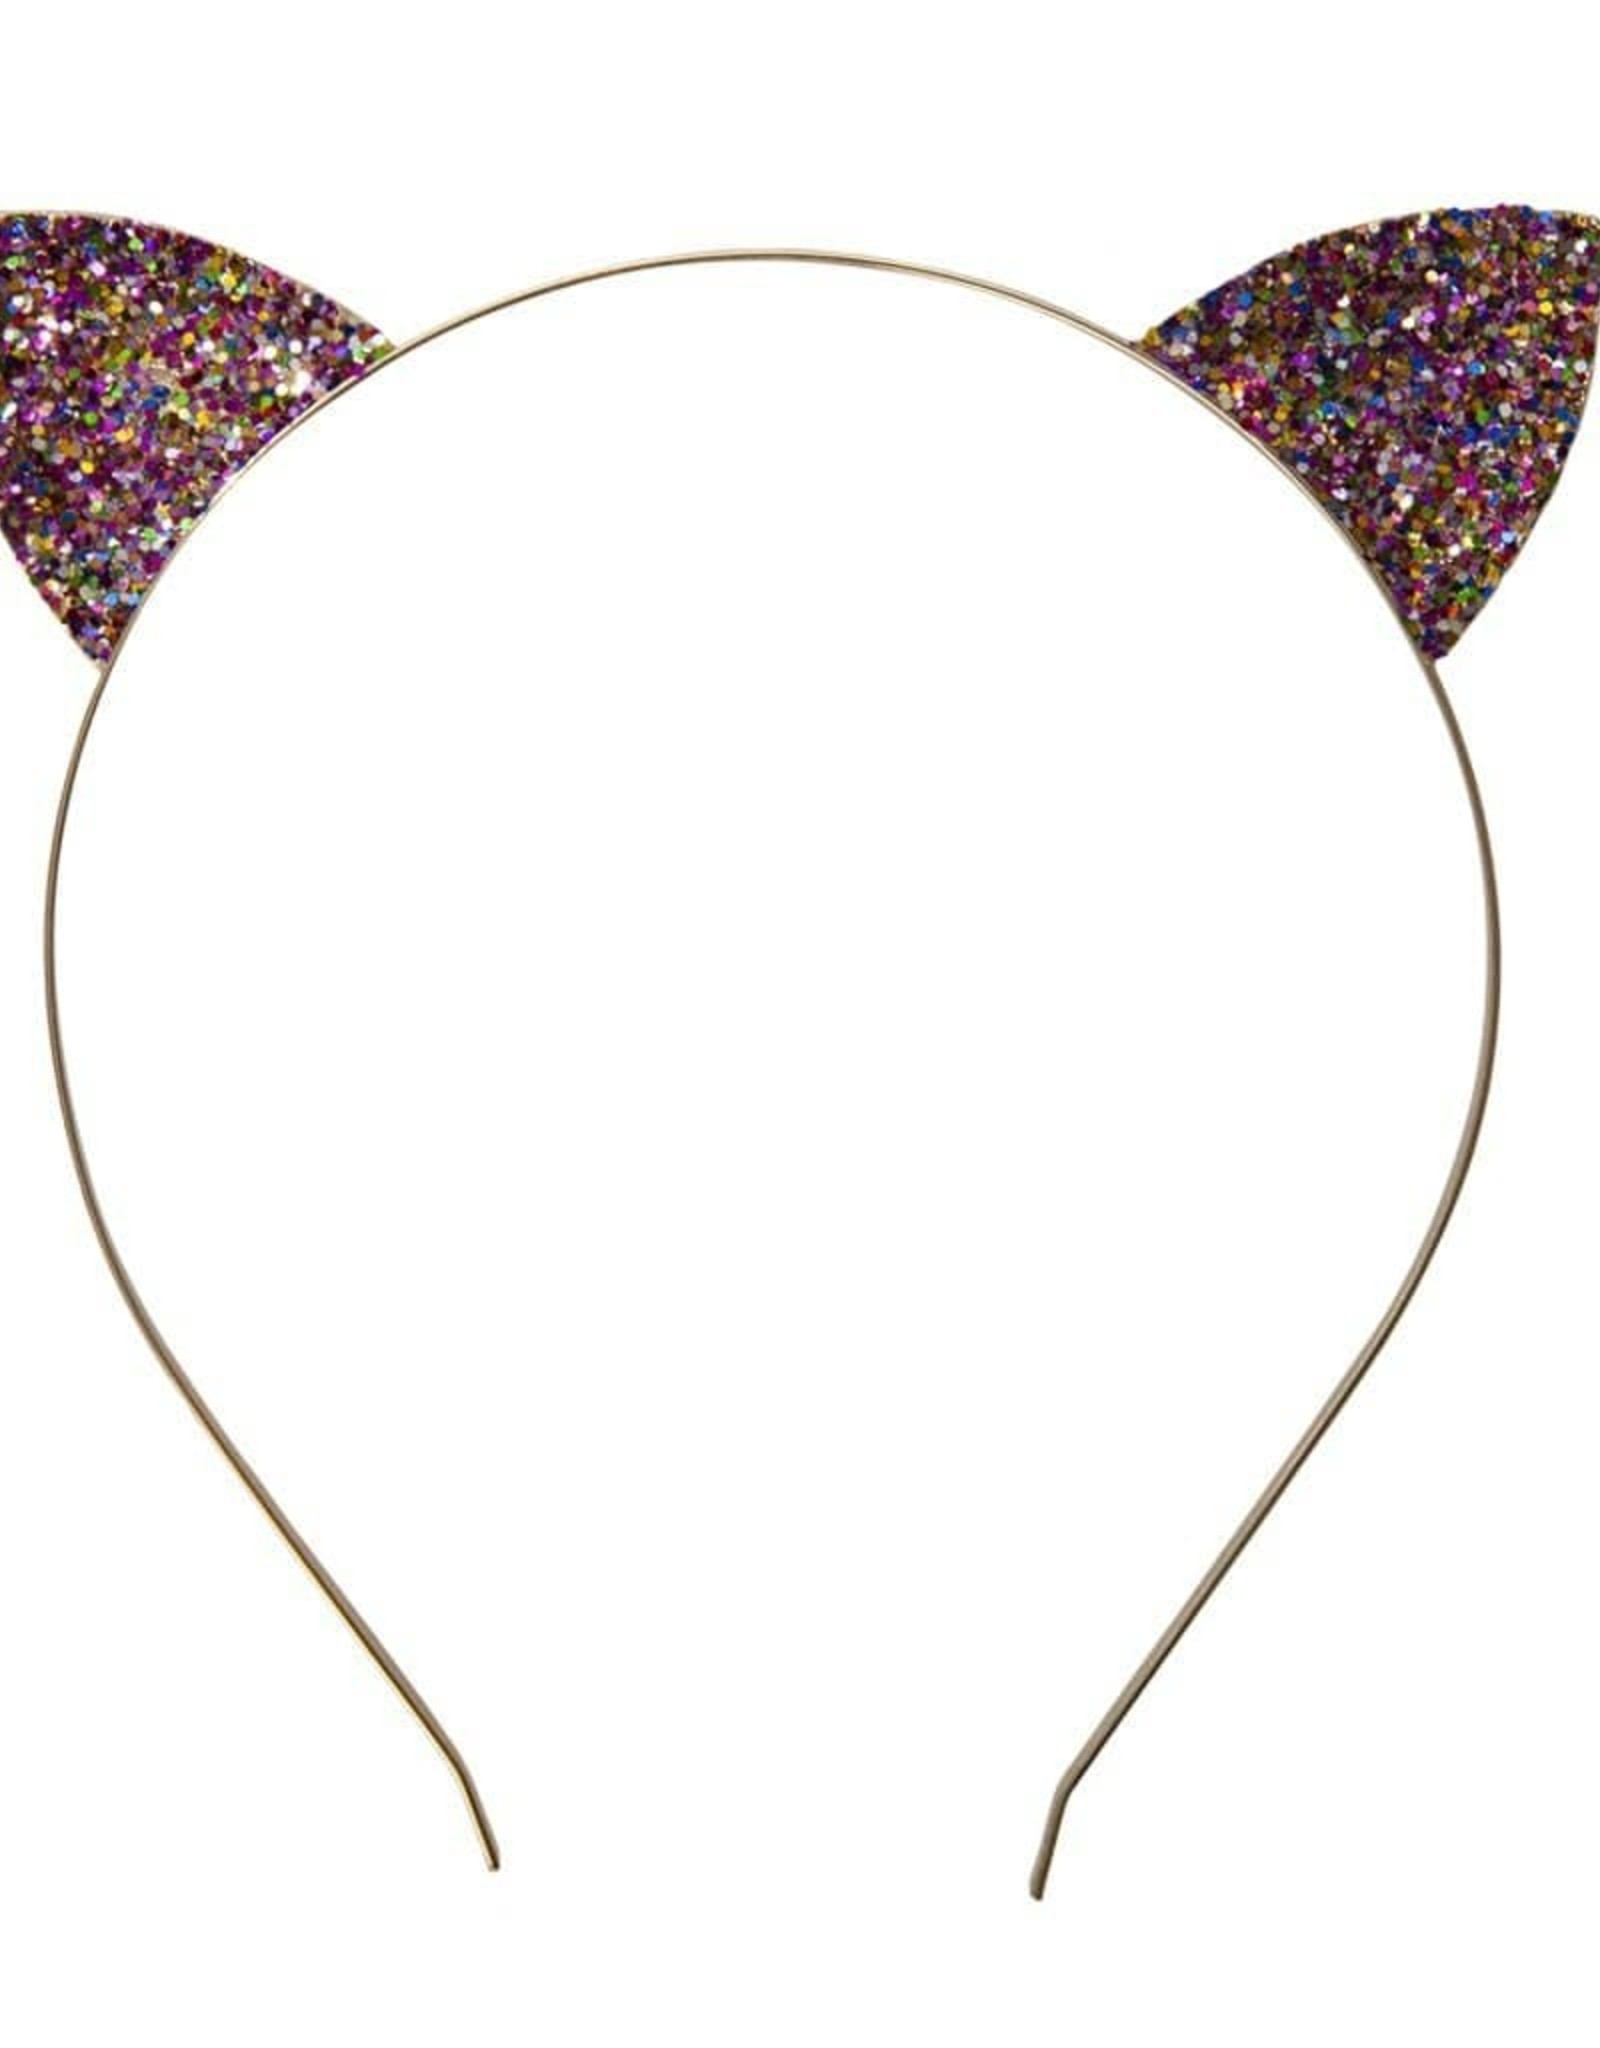 Creative Education Glitter Ears Headband